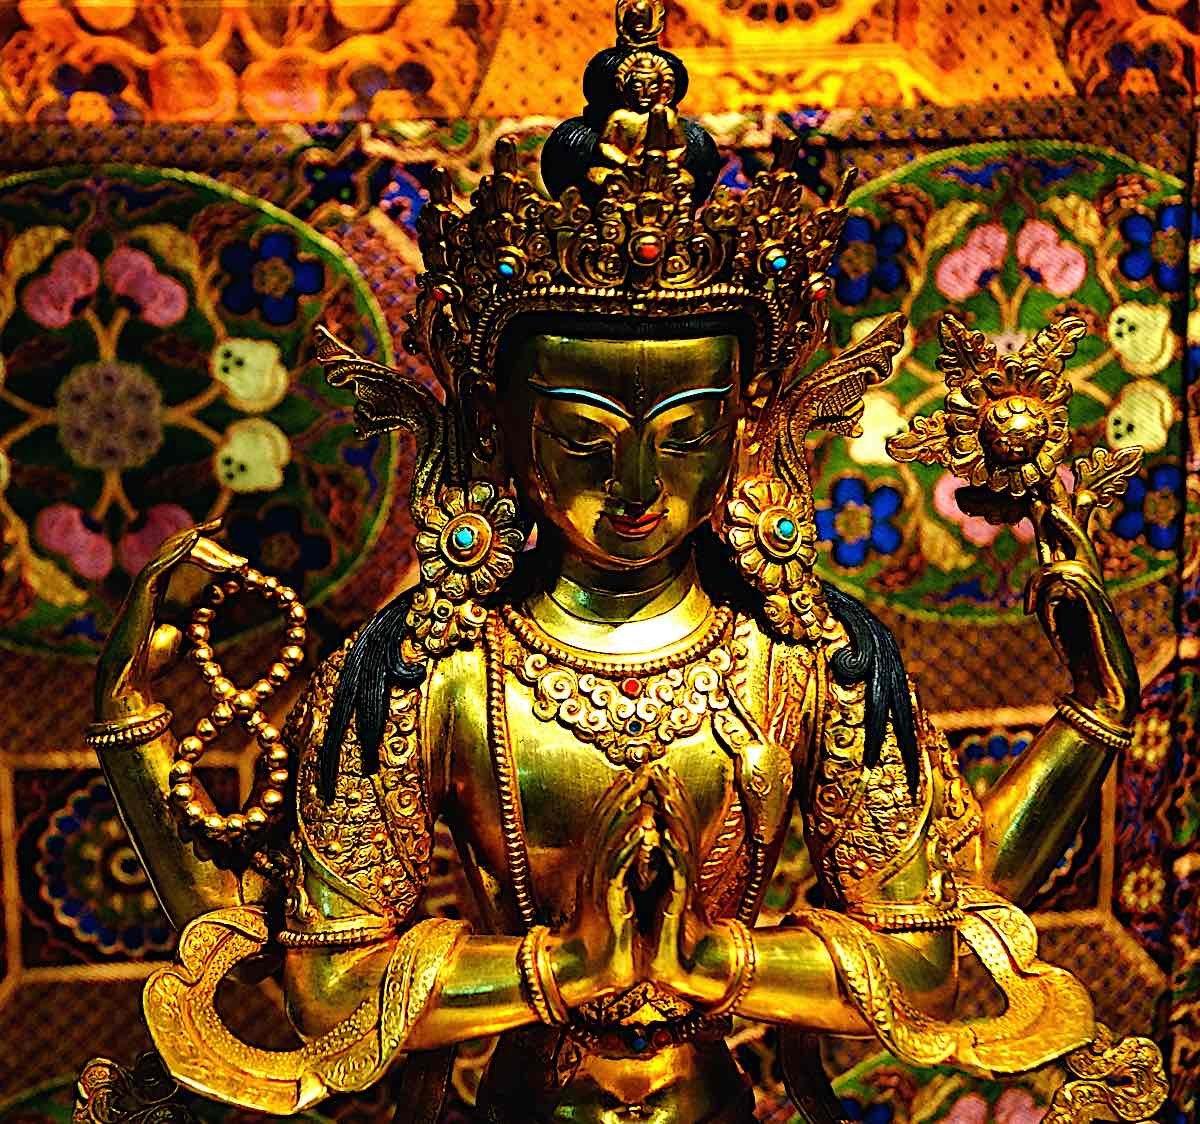 Buddha Weekly Chenrezig four armed Bodhisattva Compassion dreamstime xxl 92228024 Buddhism